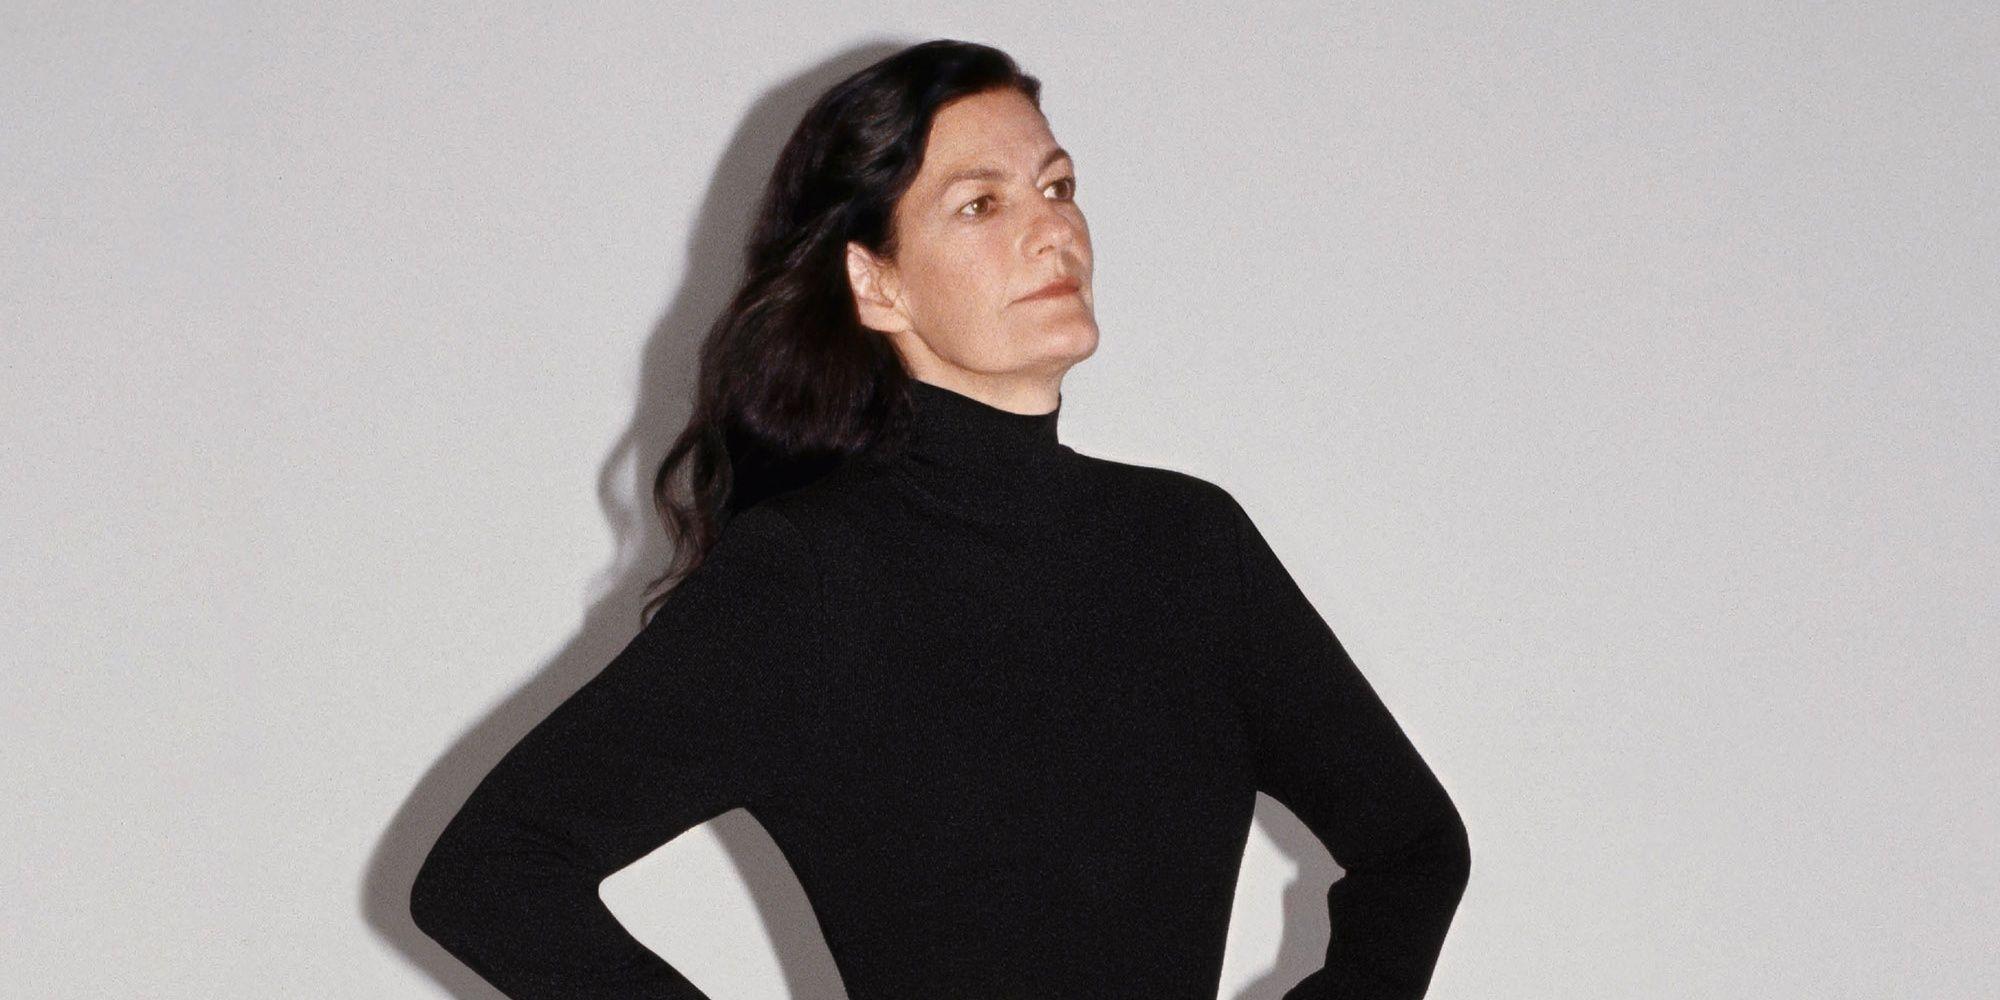 Bottega Veneta 發布 2021 早秋 Wardrobe 02 系列,提供你滿滿的居家穿搭靈感!